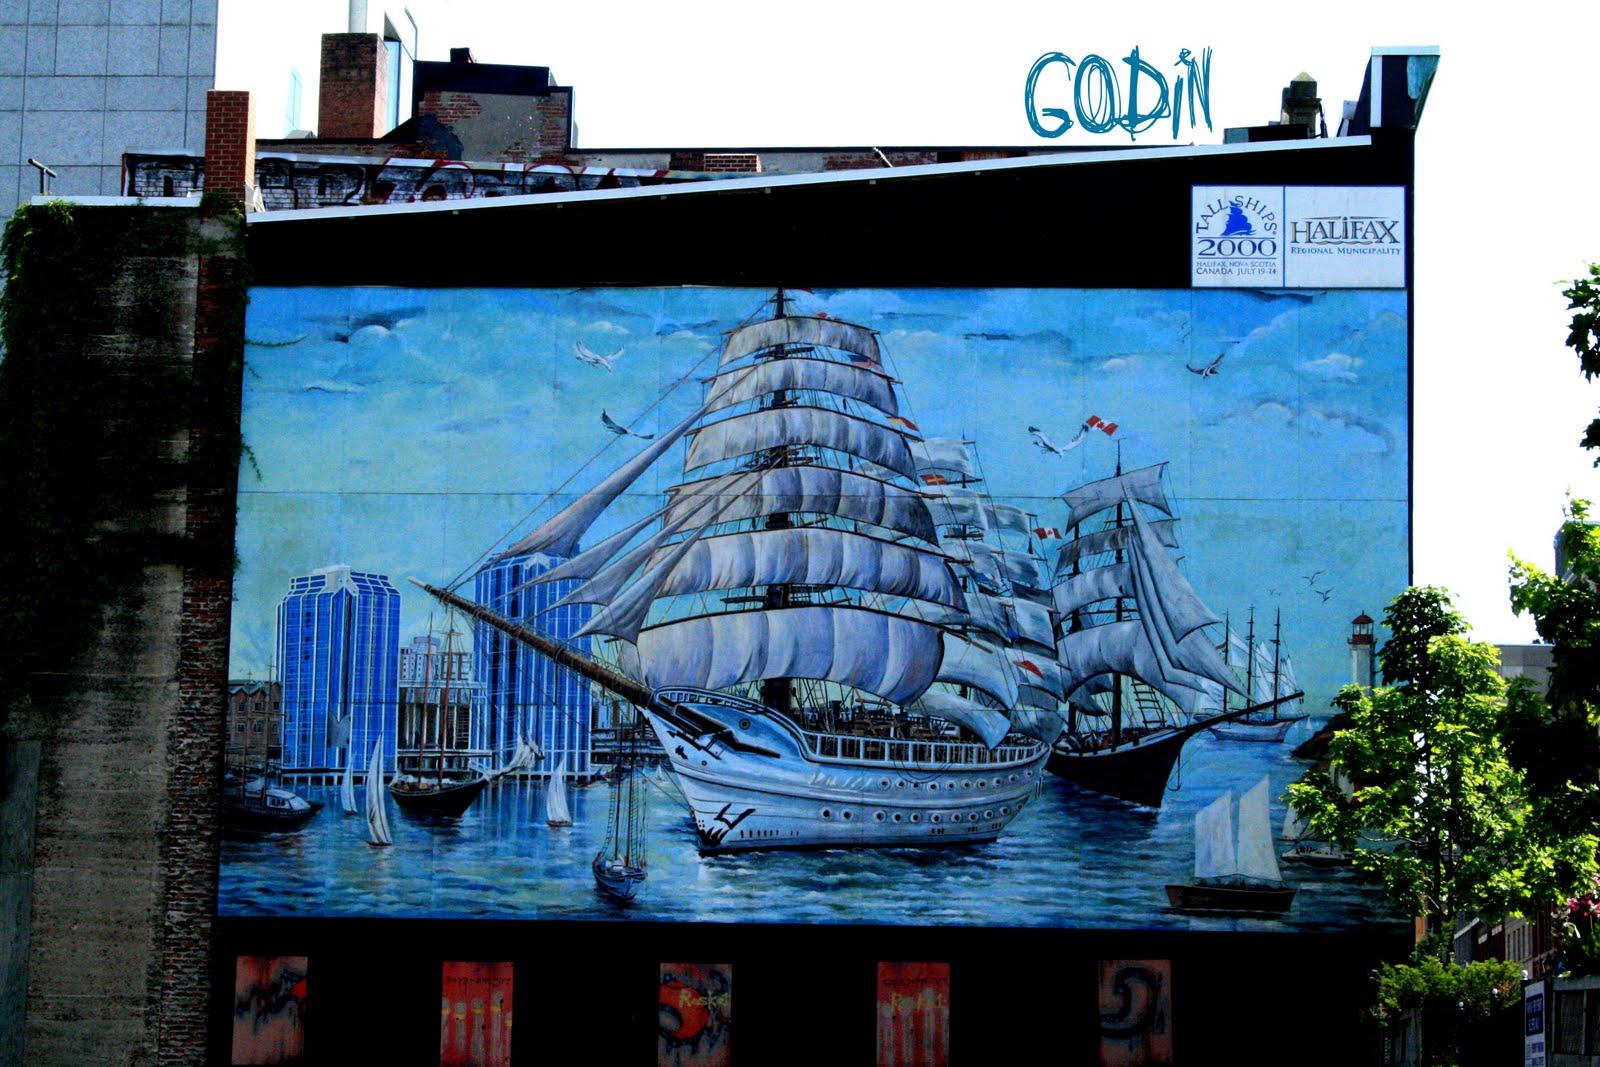 http://1.bp.blogspot.com/-wbEtnfAb248/TlRiNP2uF0I/AAAAAAAACVY/sGUHI_WkcmQ/s1600/Godin_Halifax_Tall-Ships.jpg